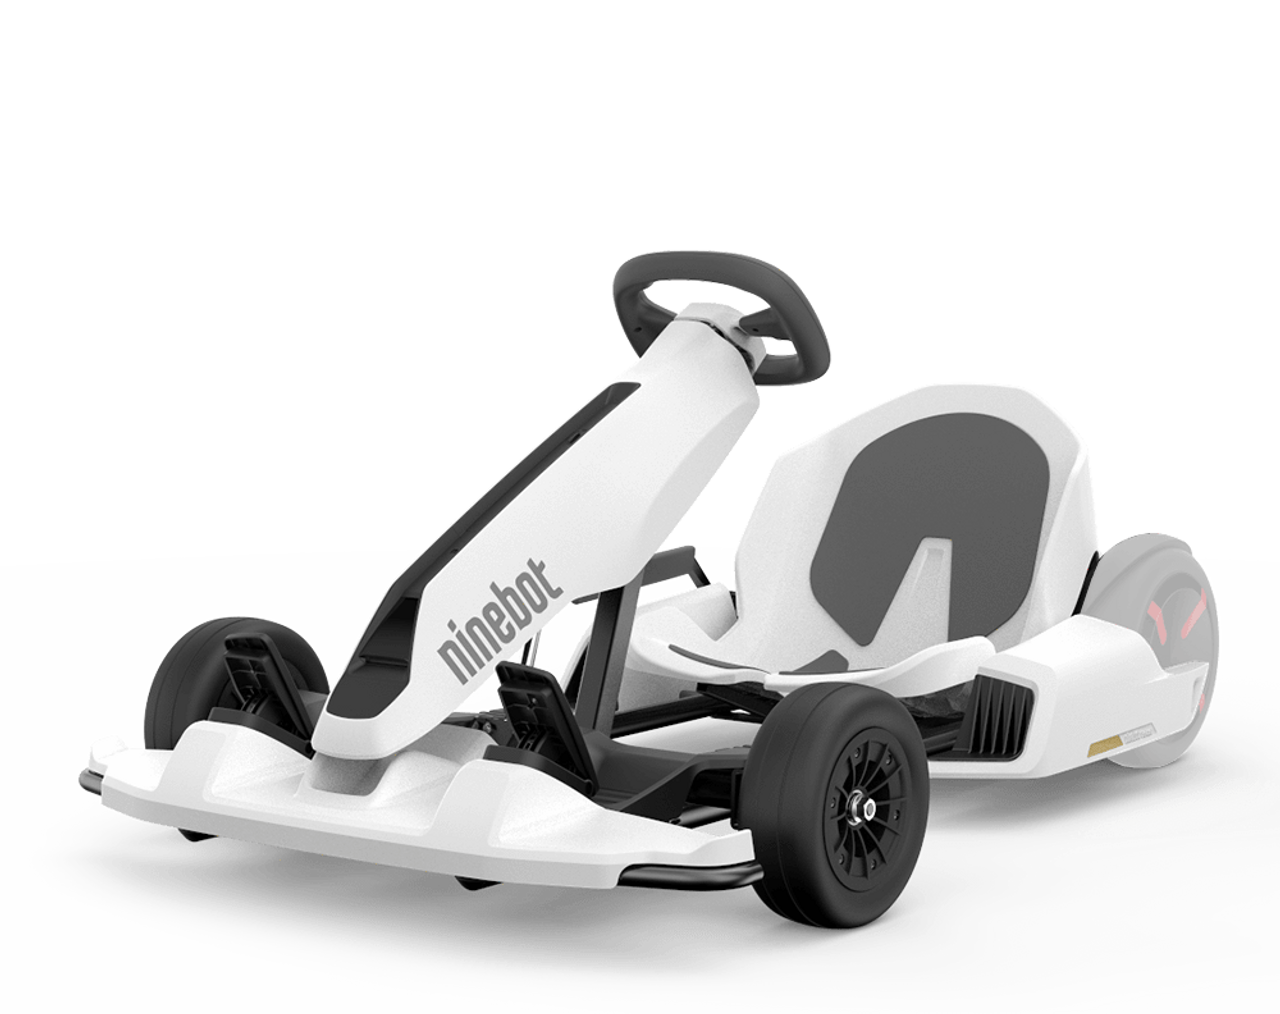 Segway Ninebot miniPRO Gokart Kit